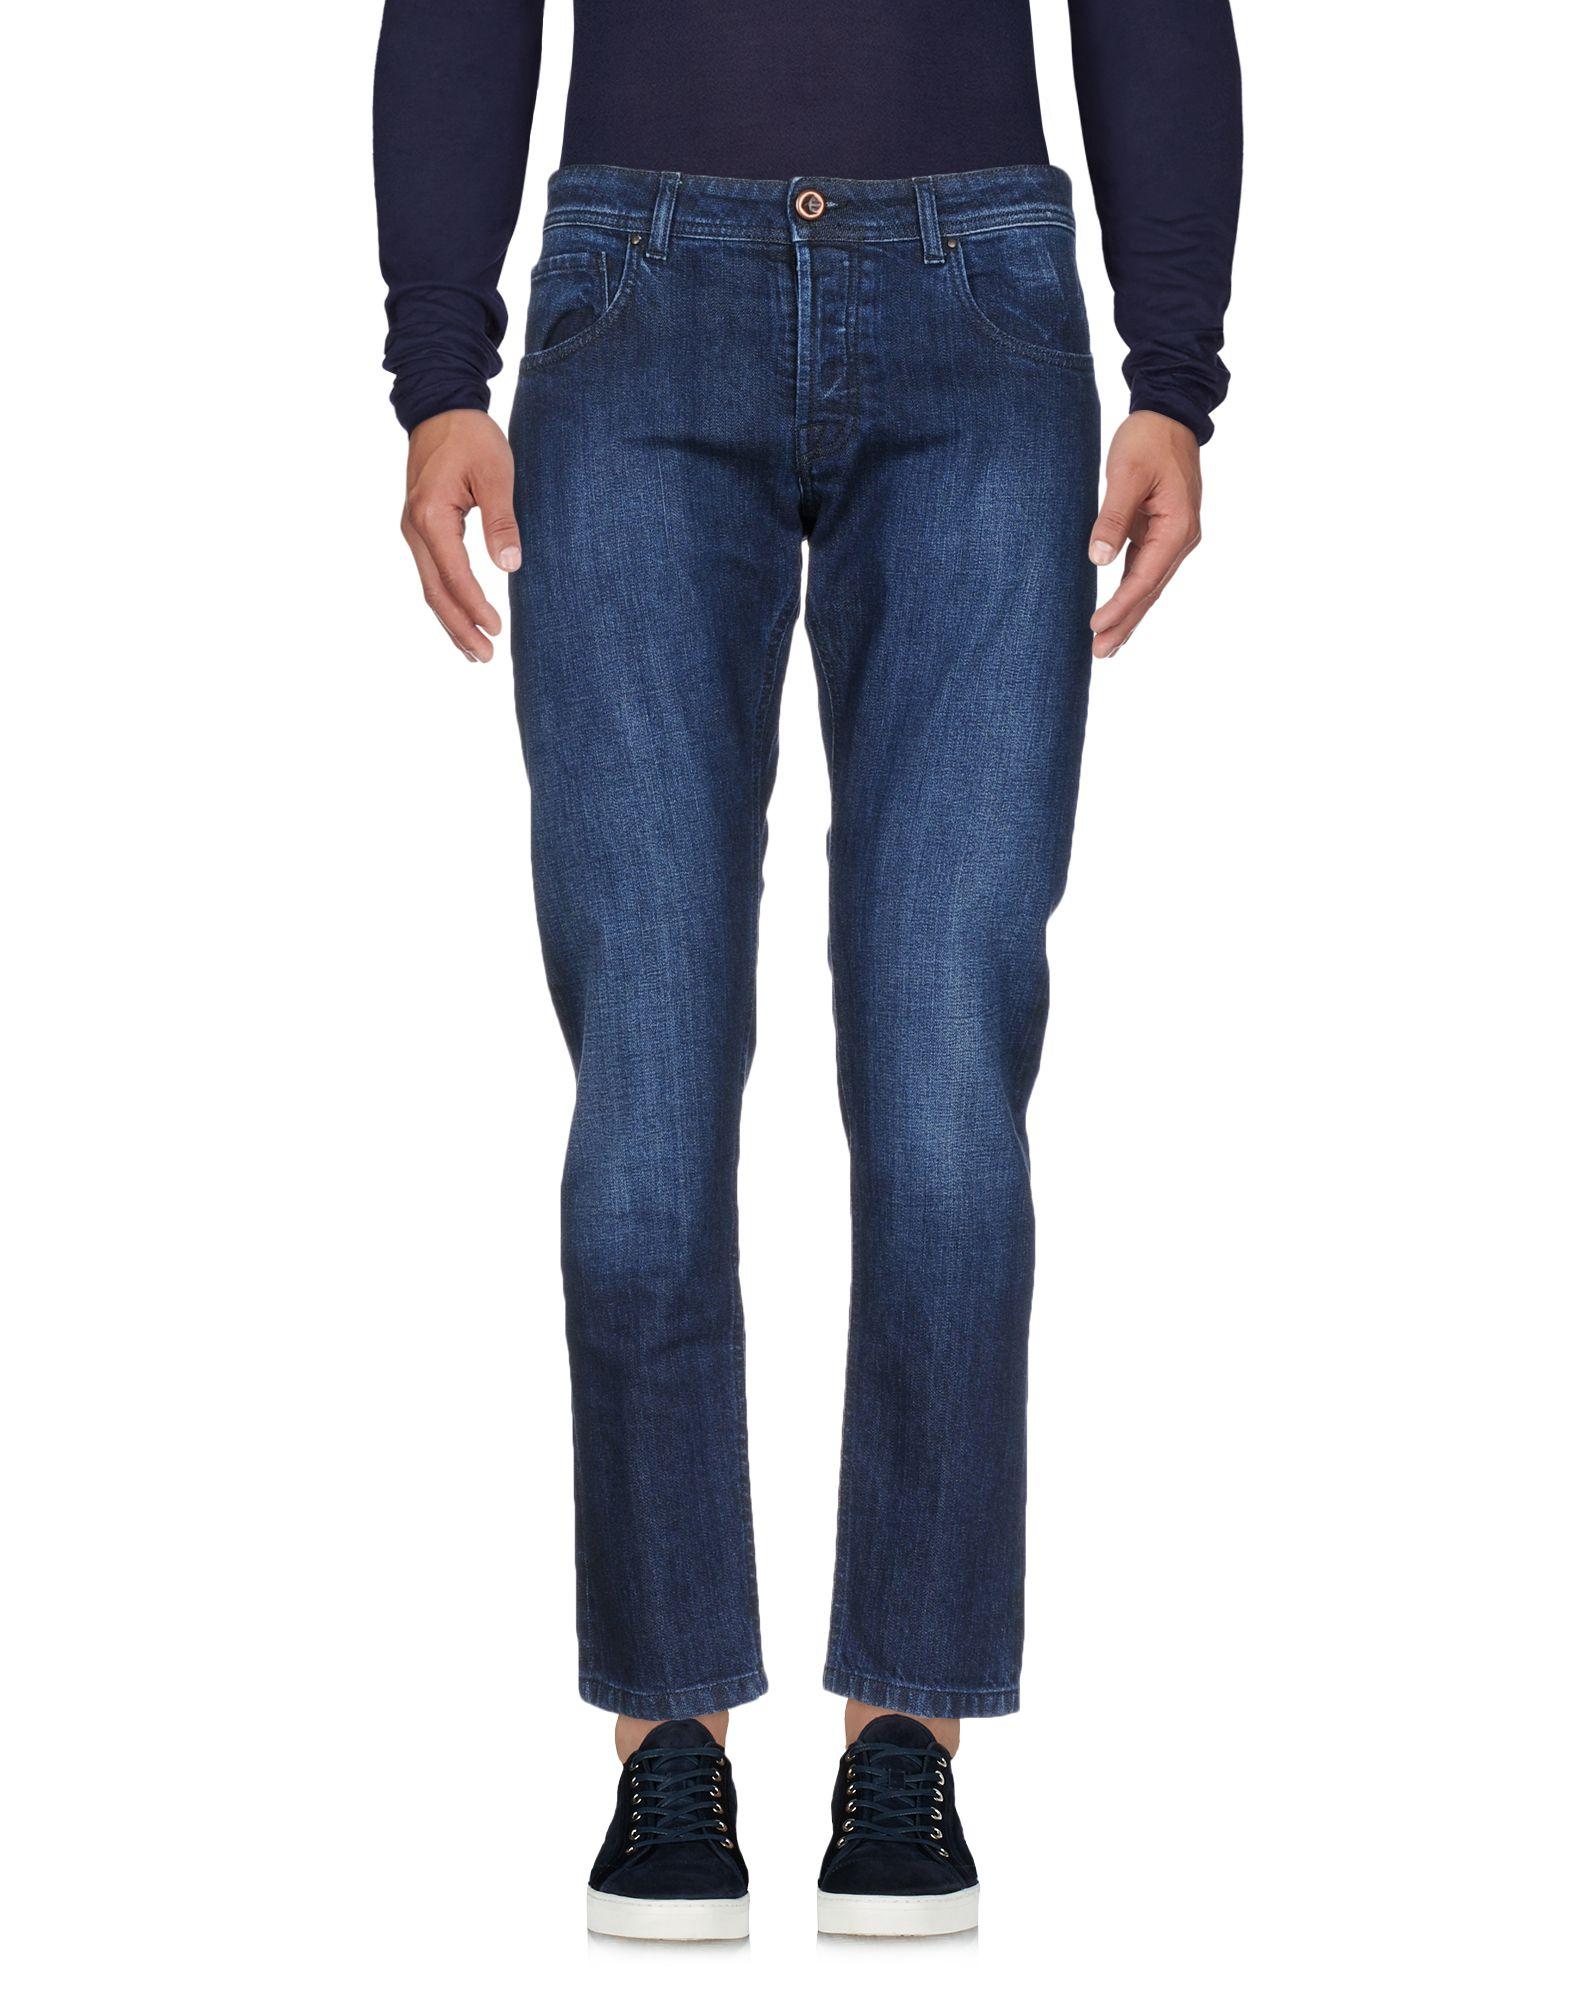 HELLMANN Джинсовые брюки patrick hellmann водолазка от patrick hellmann s3056 черный